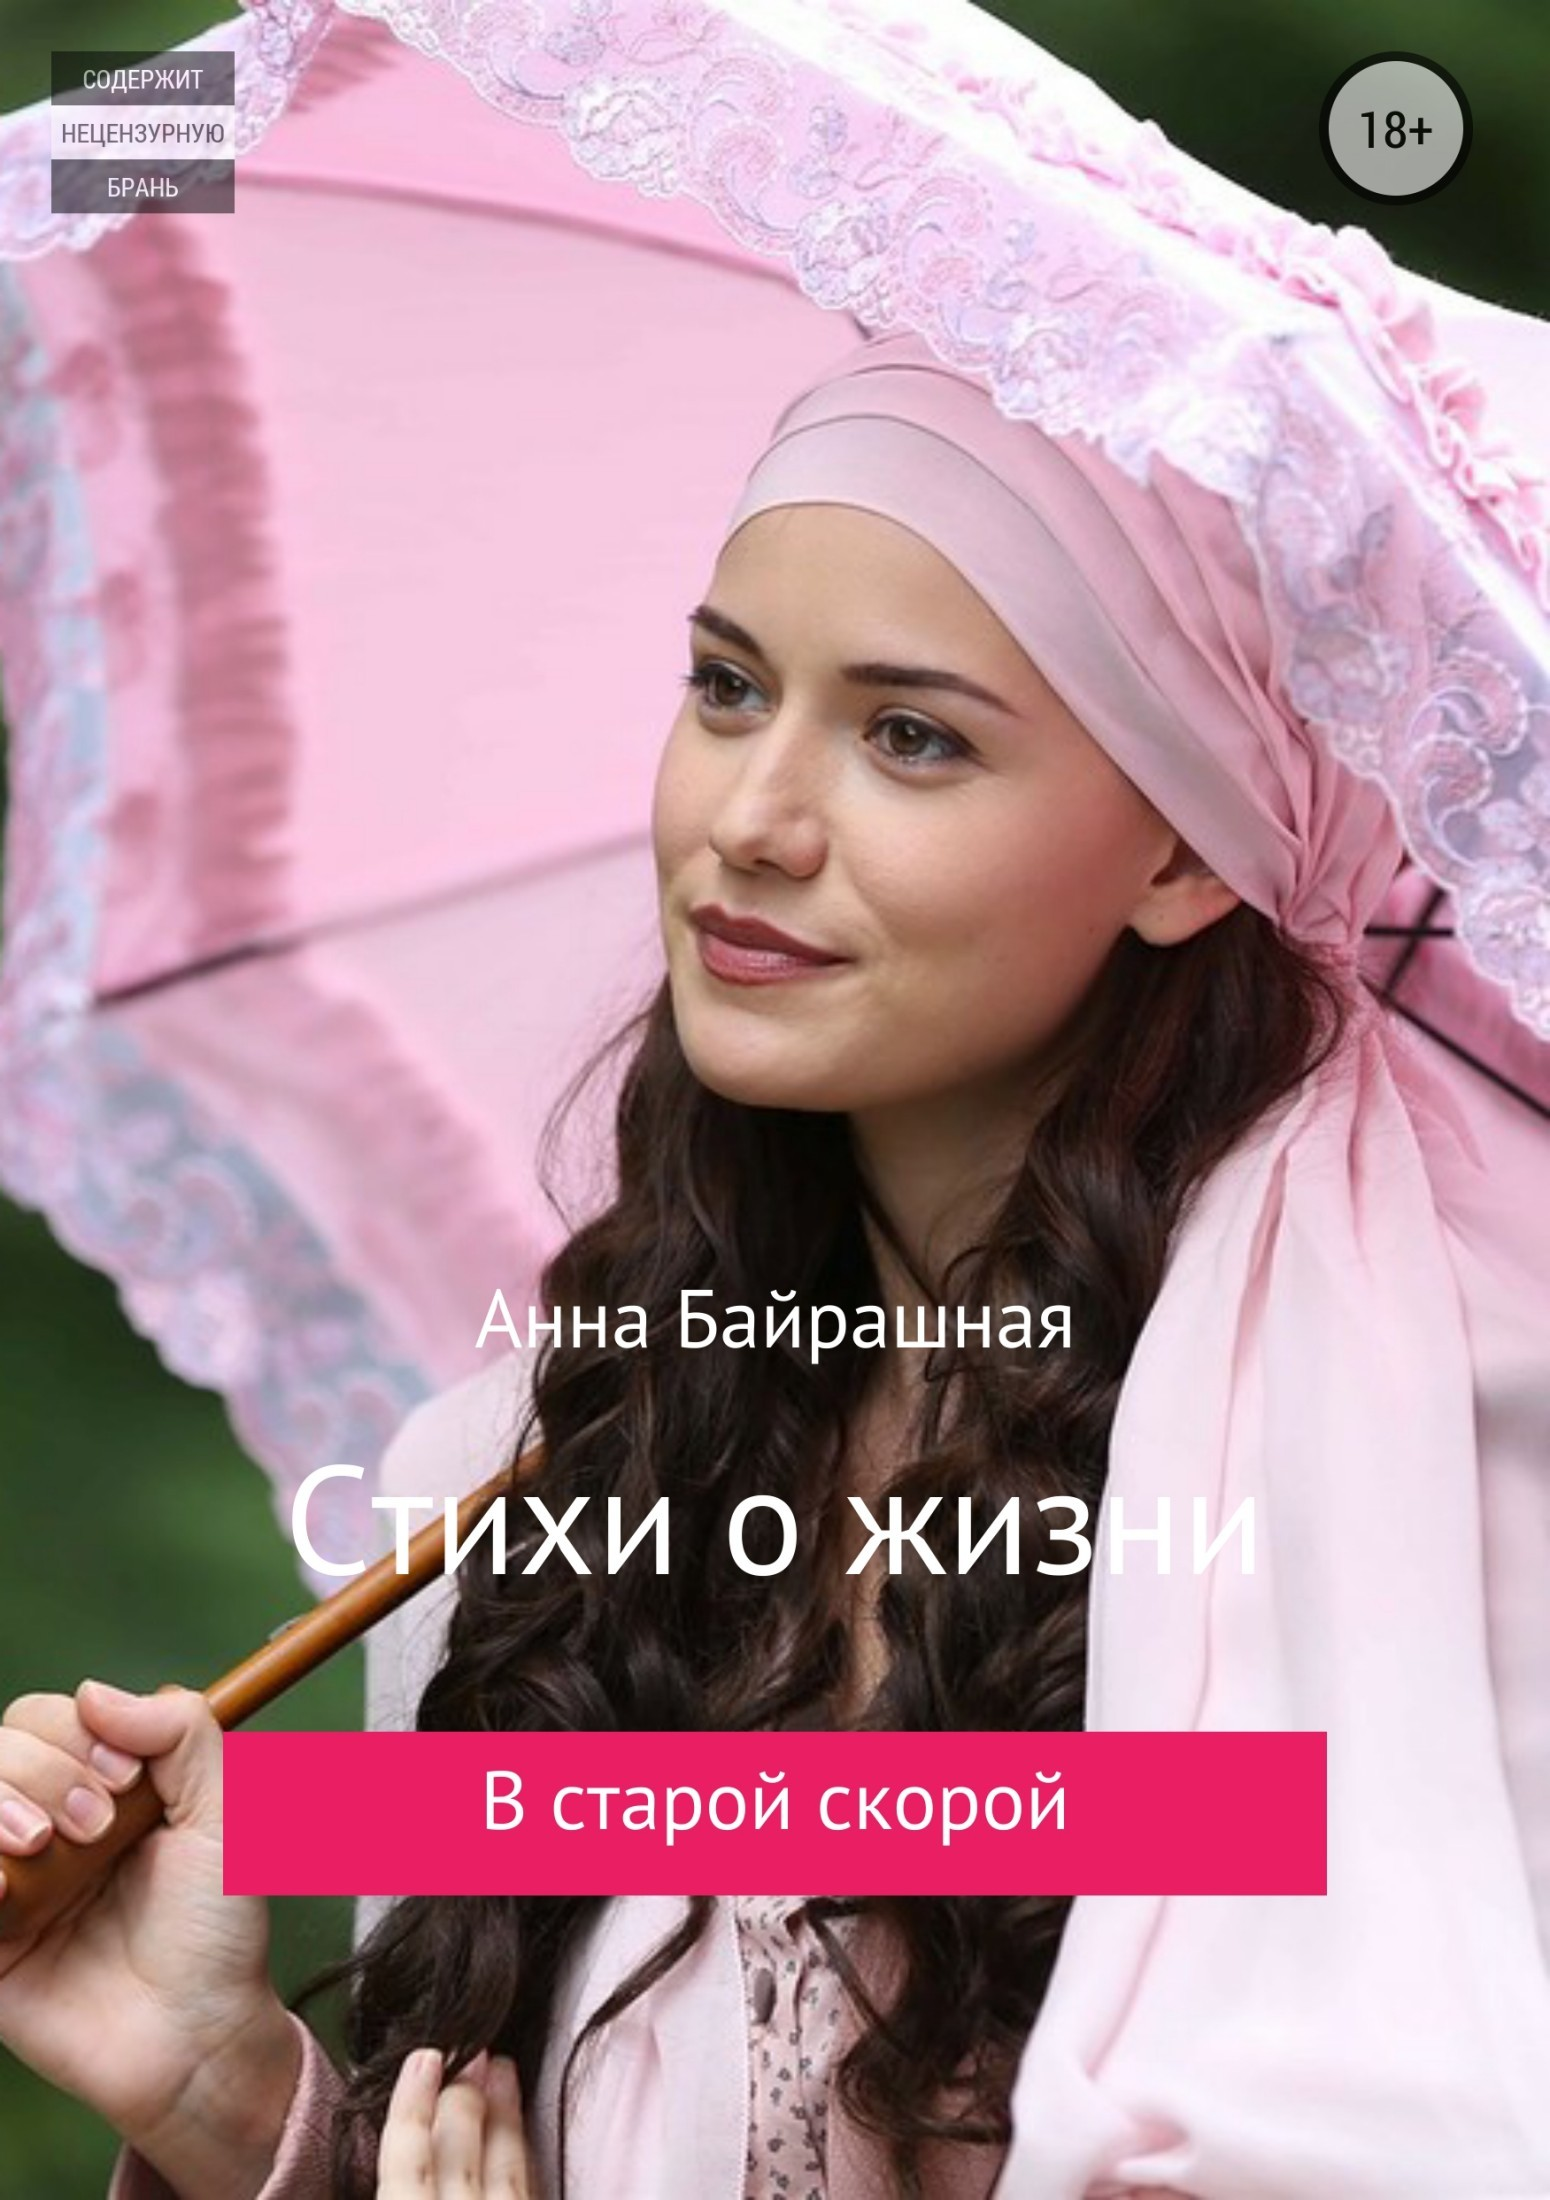 Анна Сергеевна Байрашная бесплатно